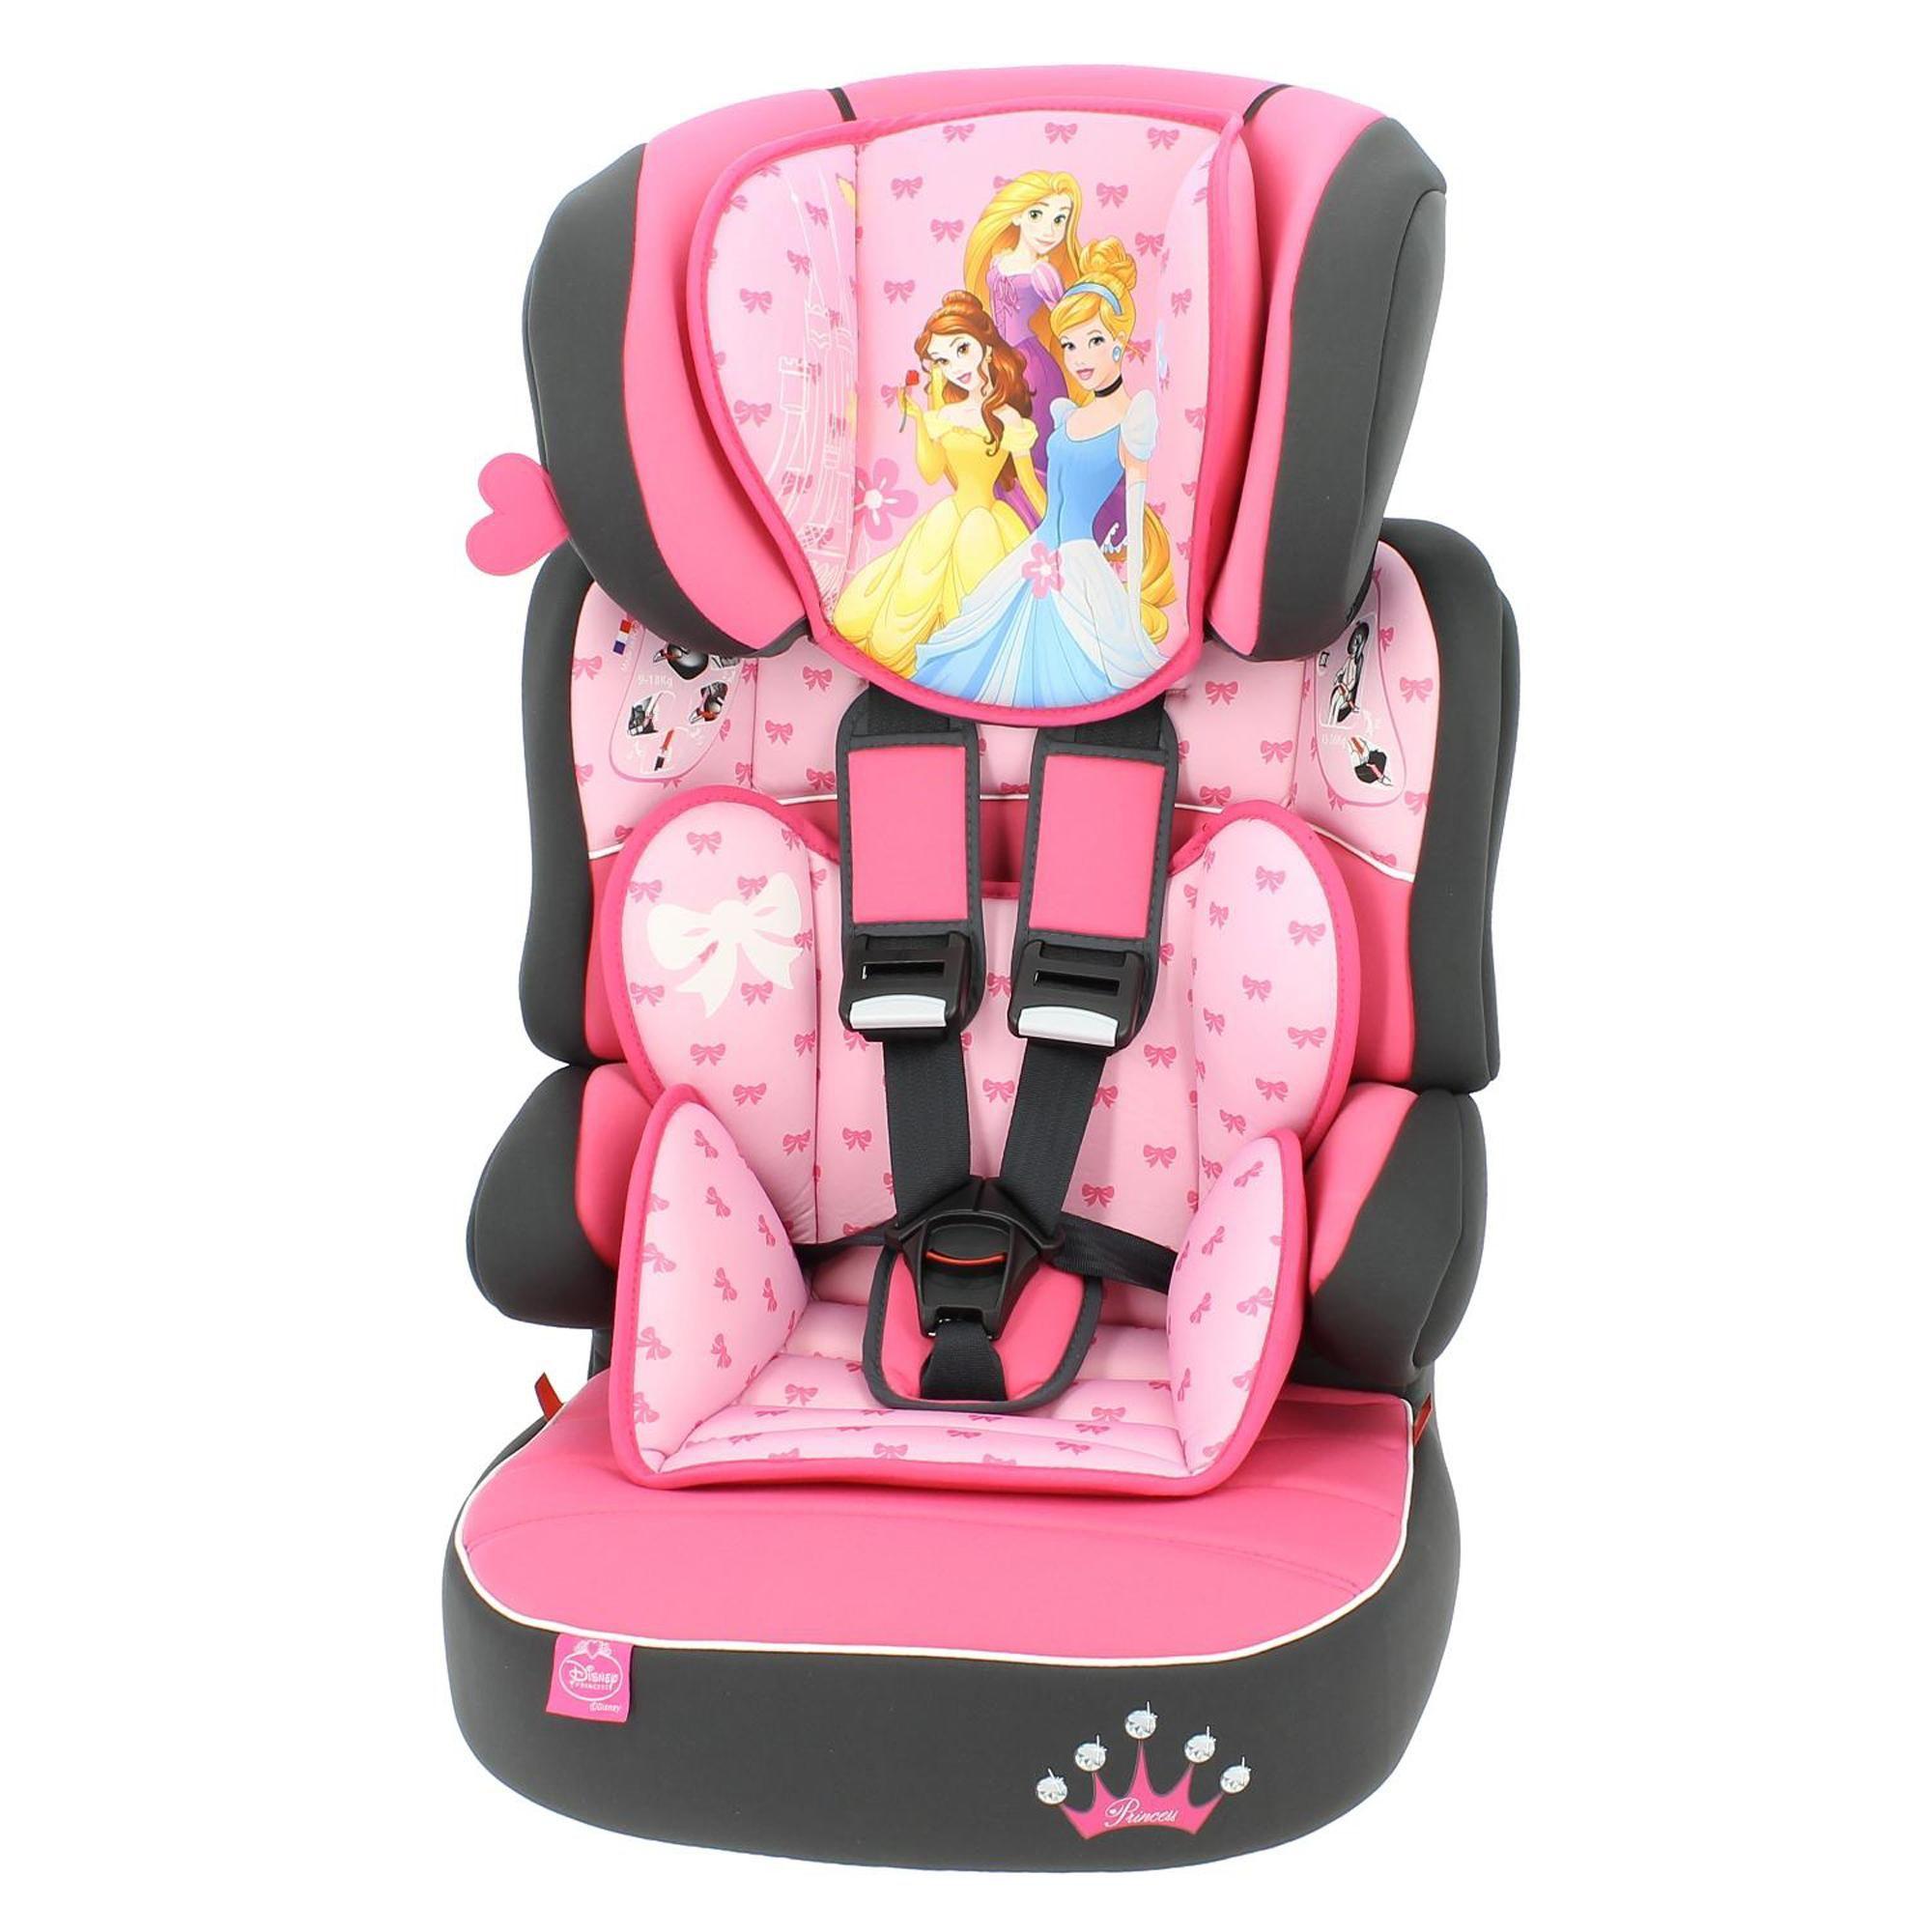 Disney Princess Beline SP LX Group 1 2 3 Car Seat in 2020